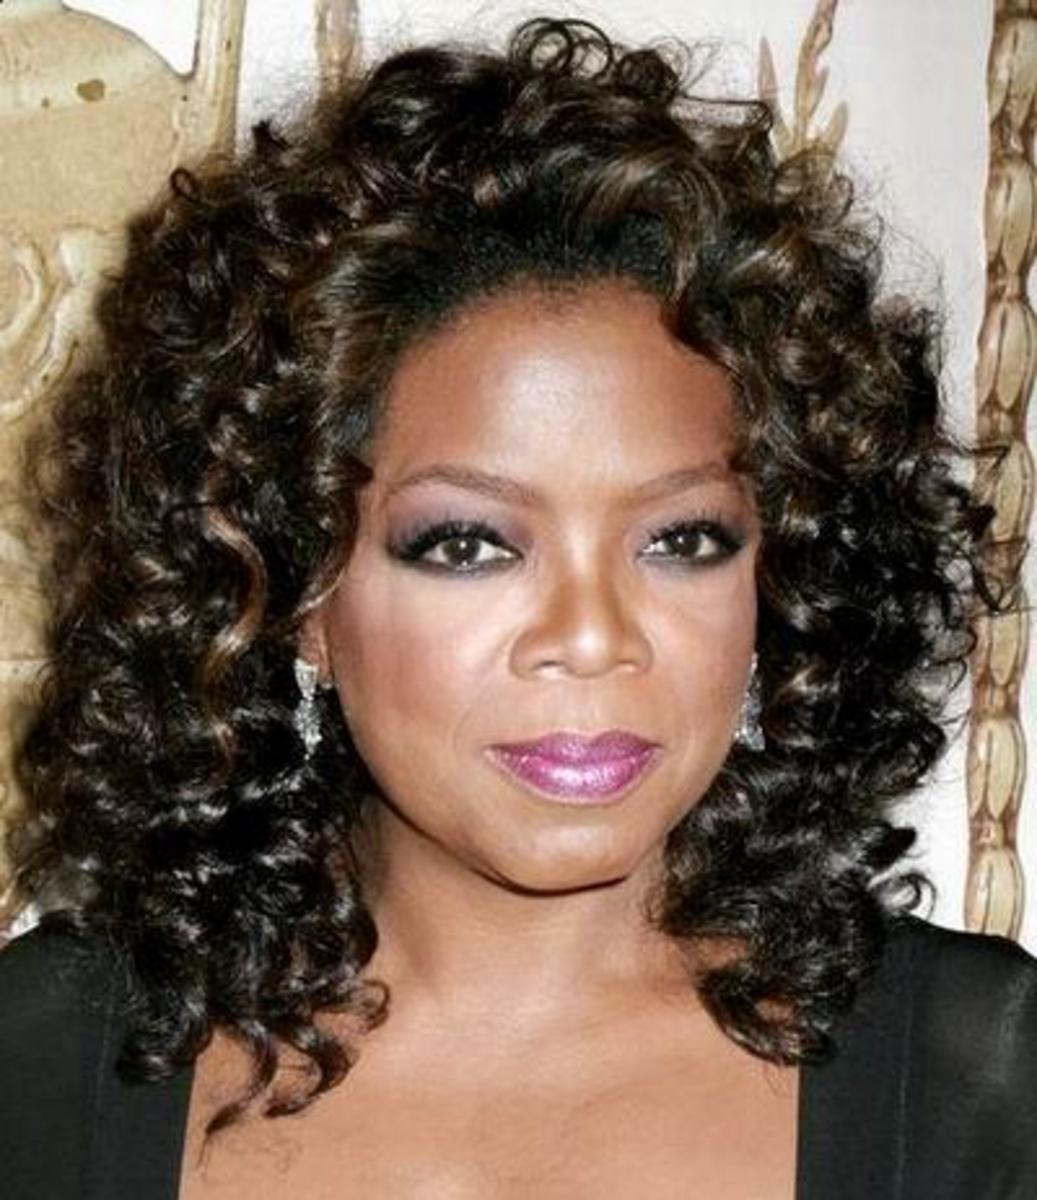 Oprah's medium-length curly hair